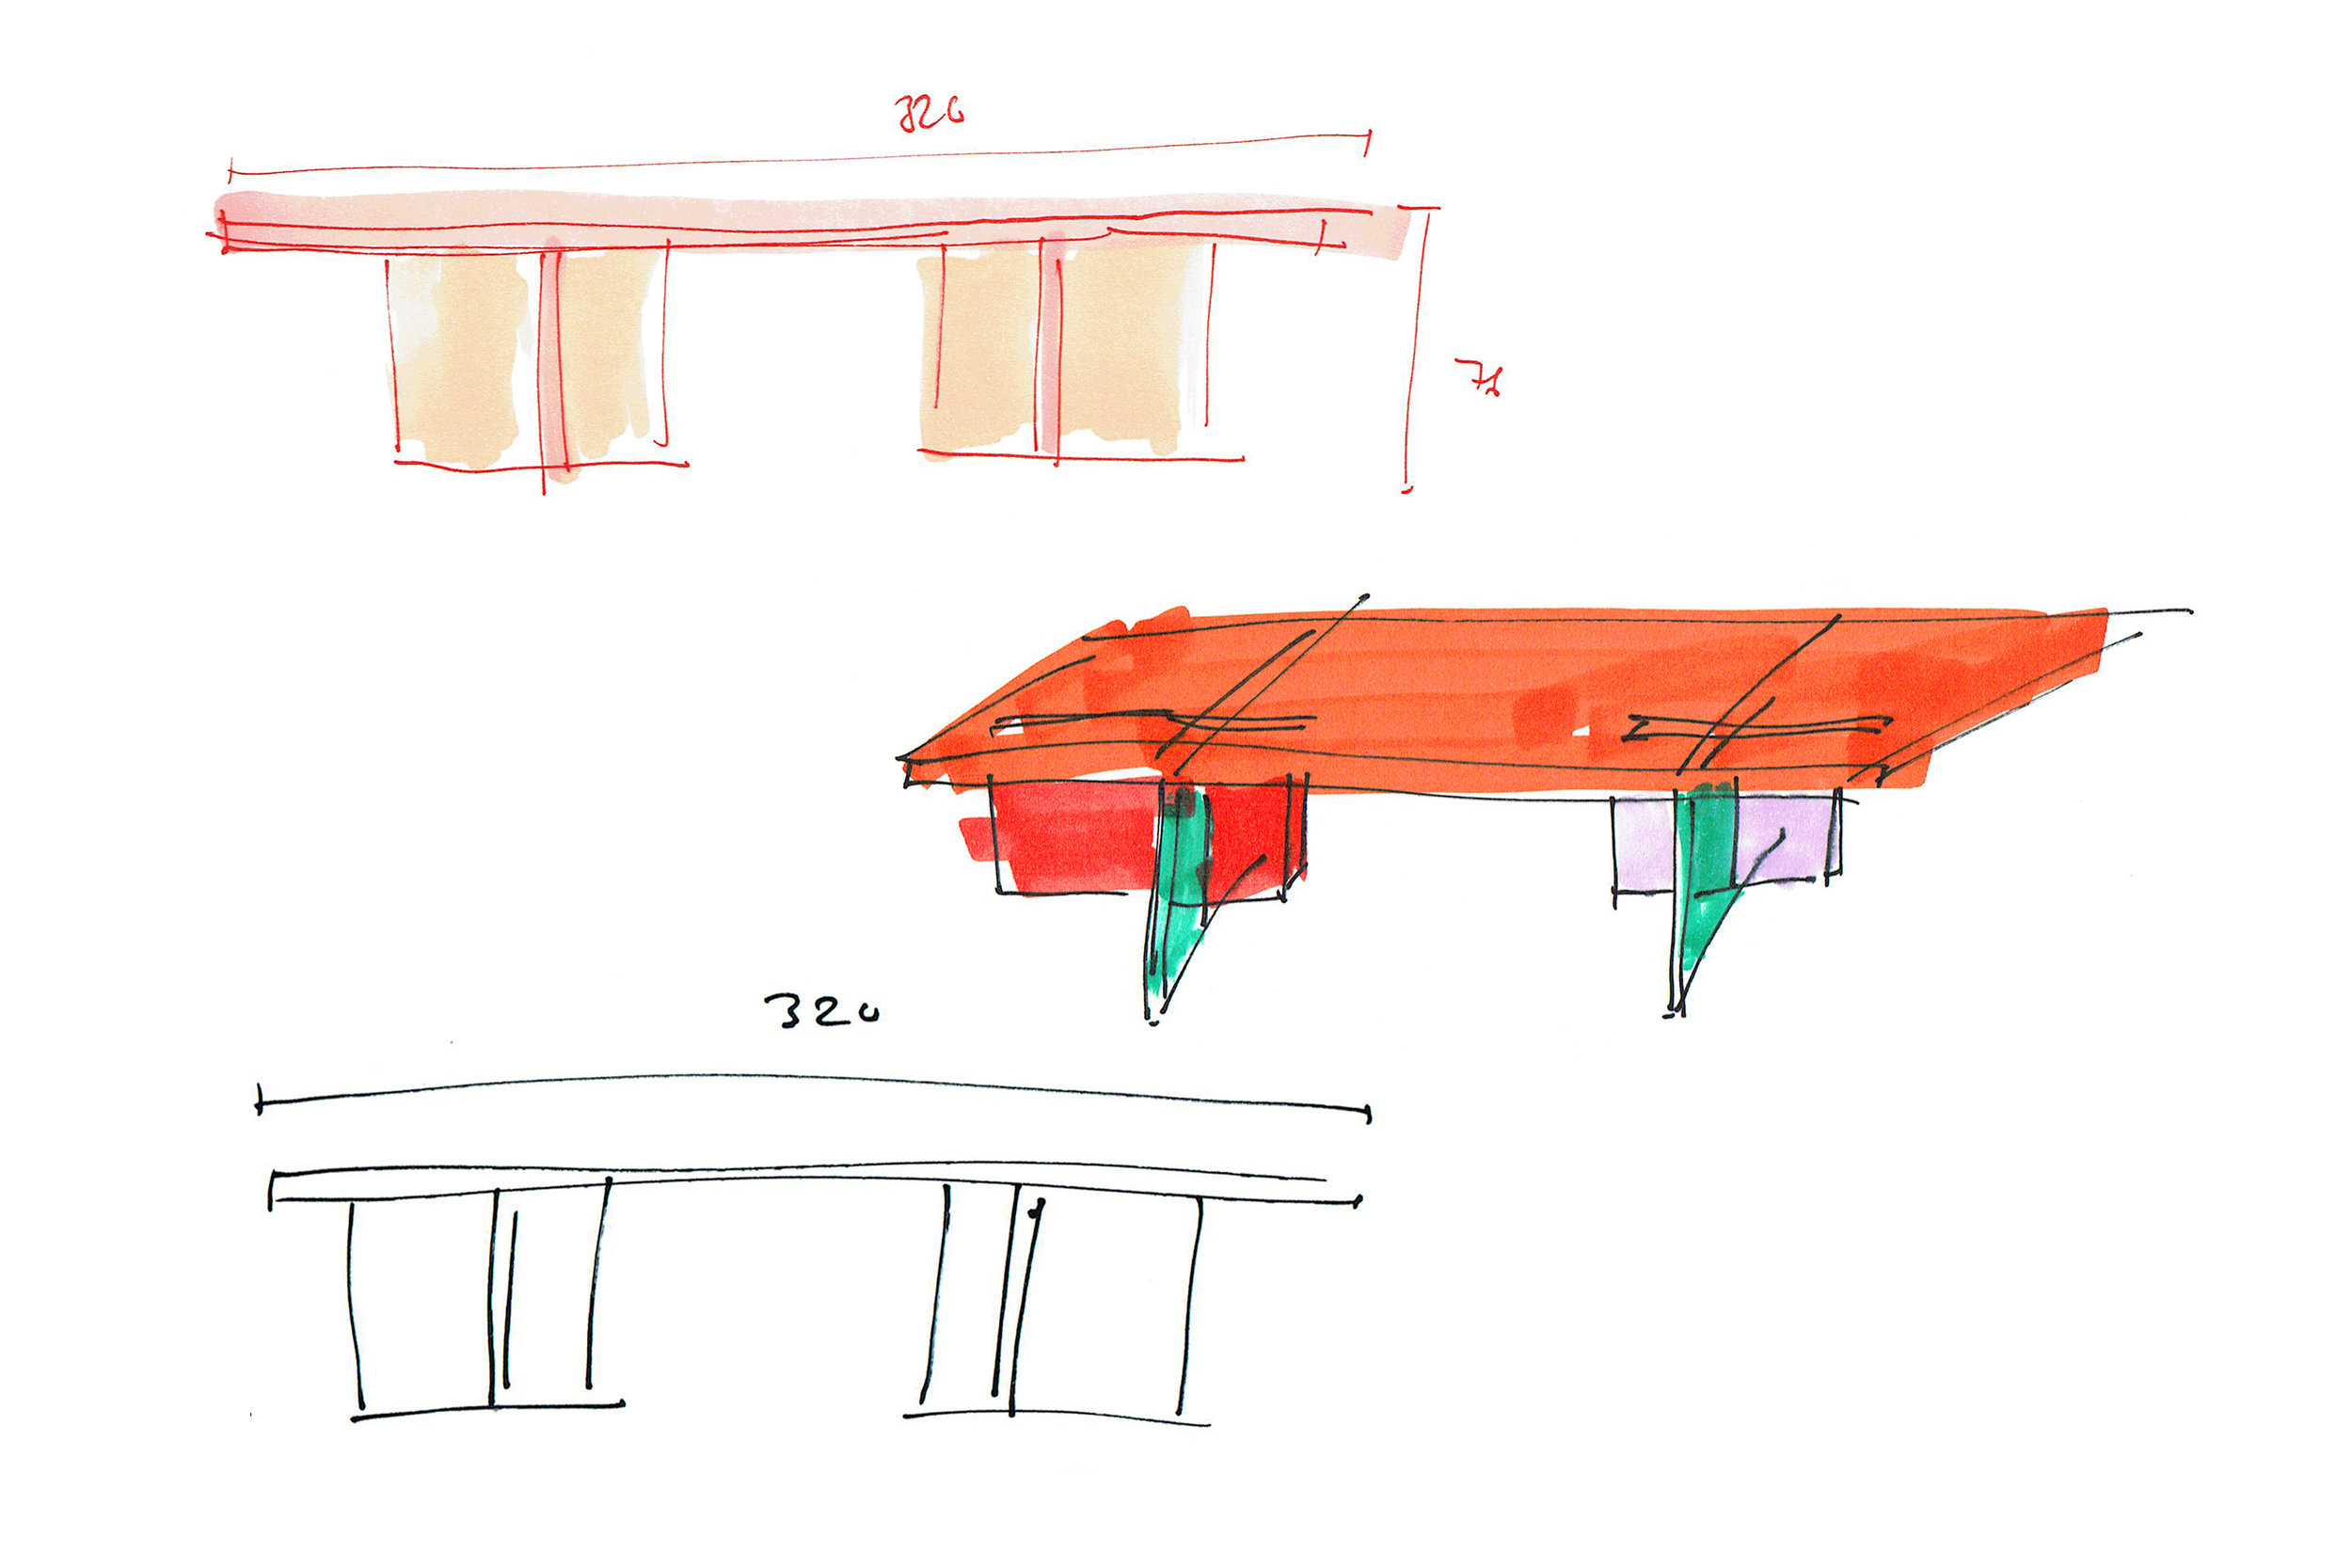 abbondio-sketches-bannach.jpg